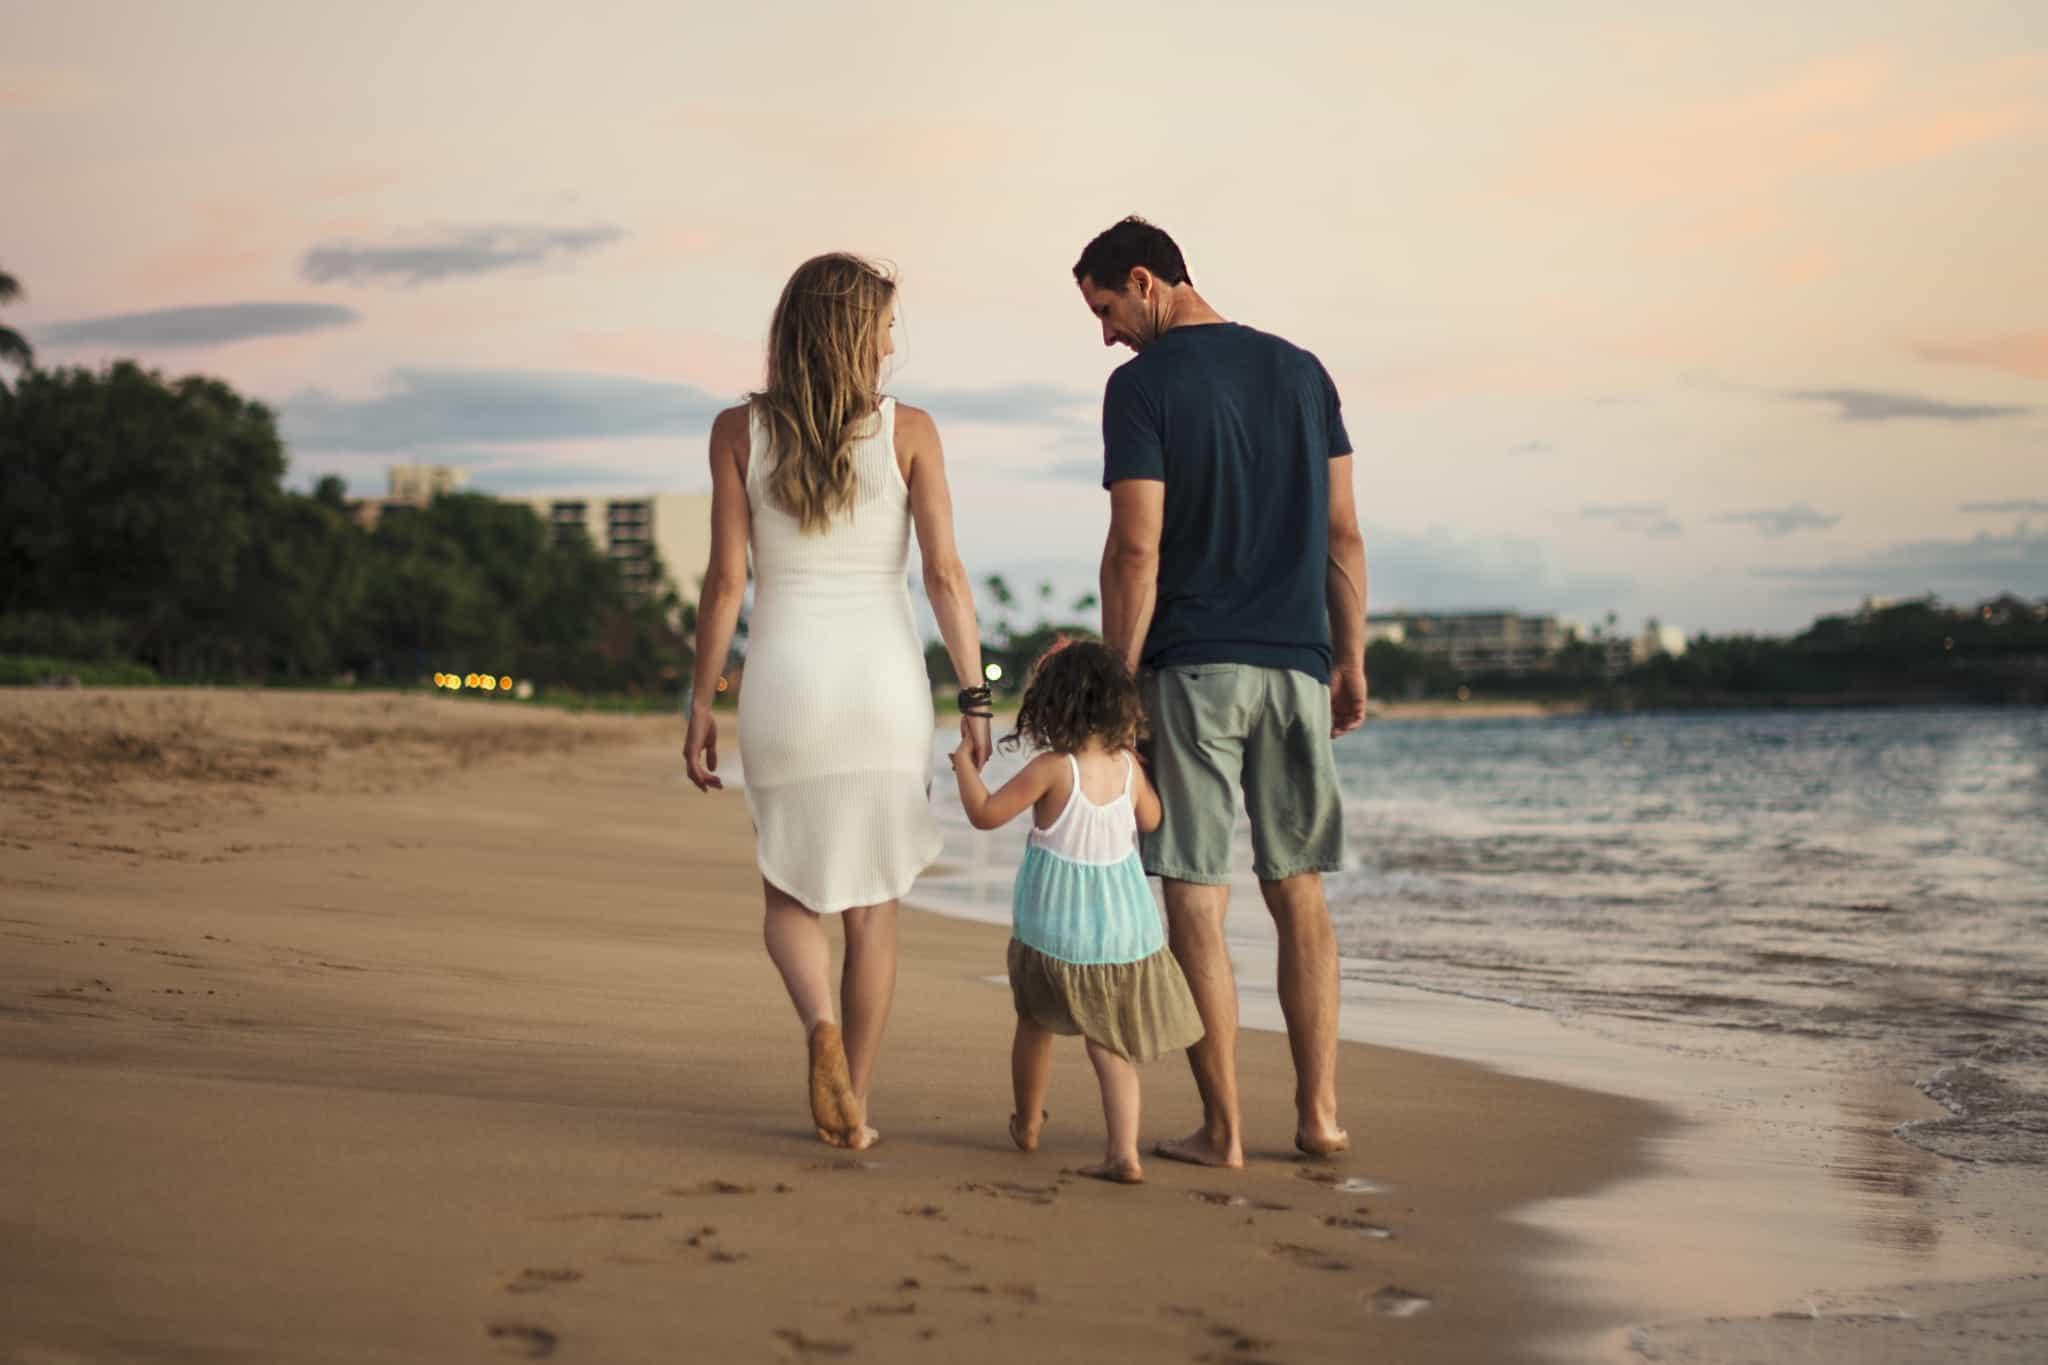 casal a passear na praia com a filha